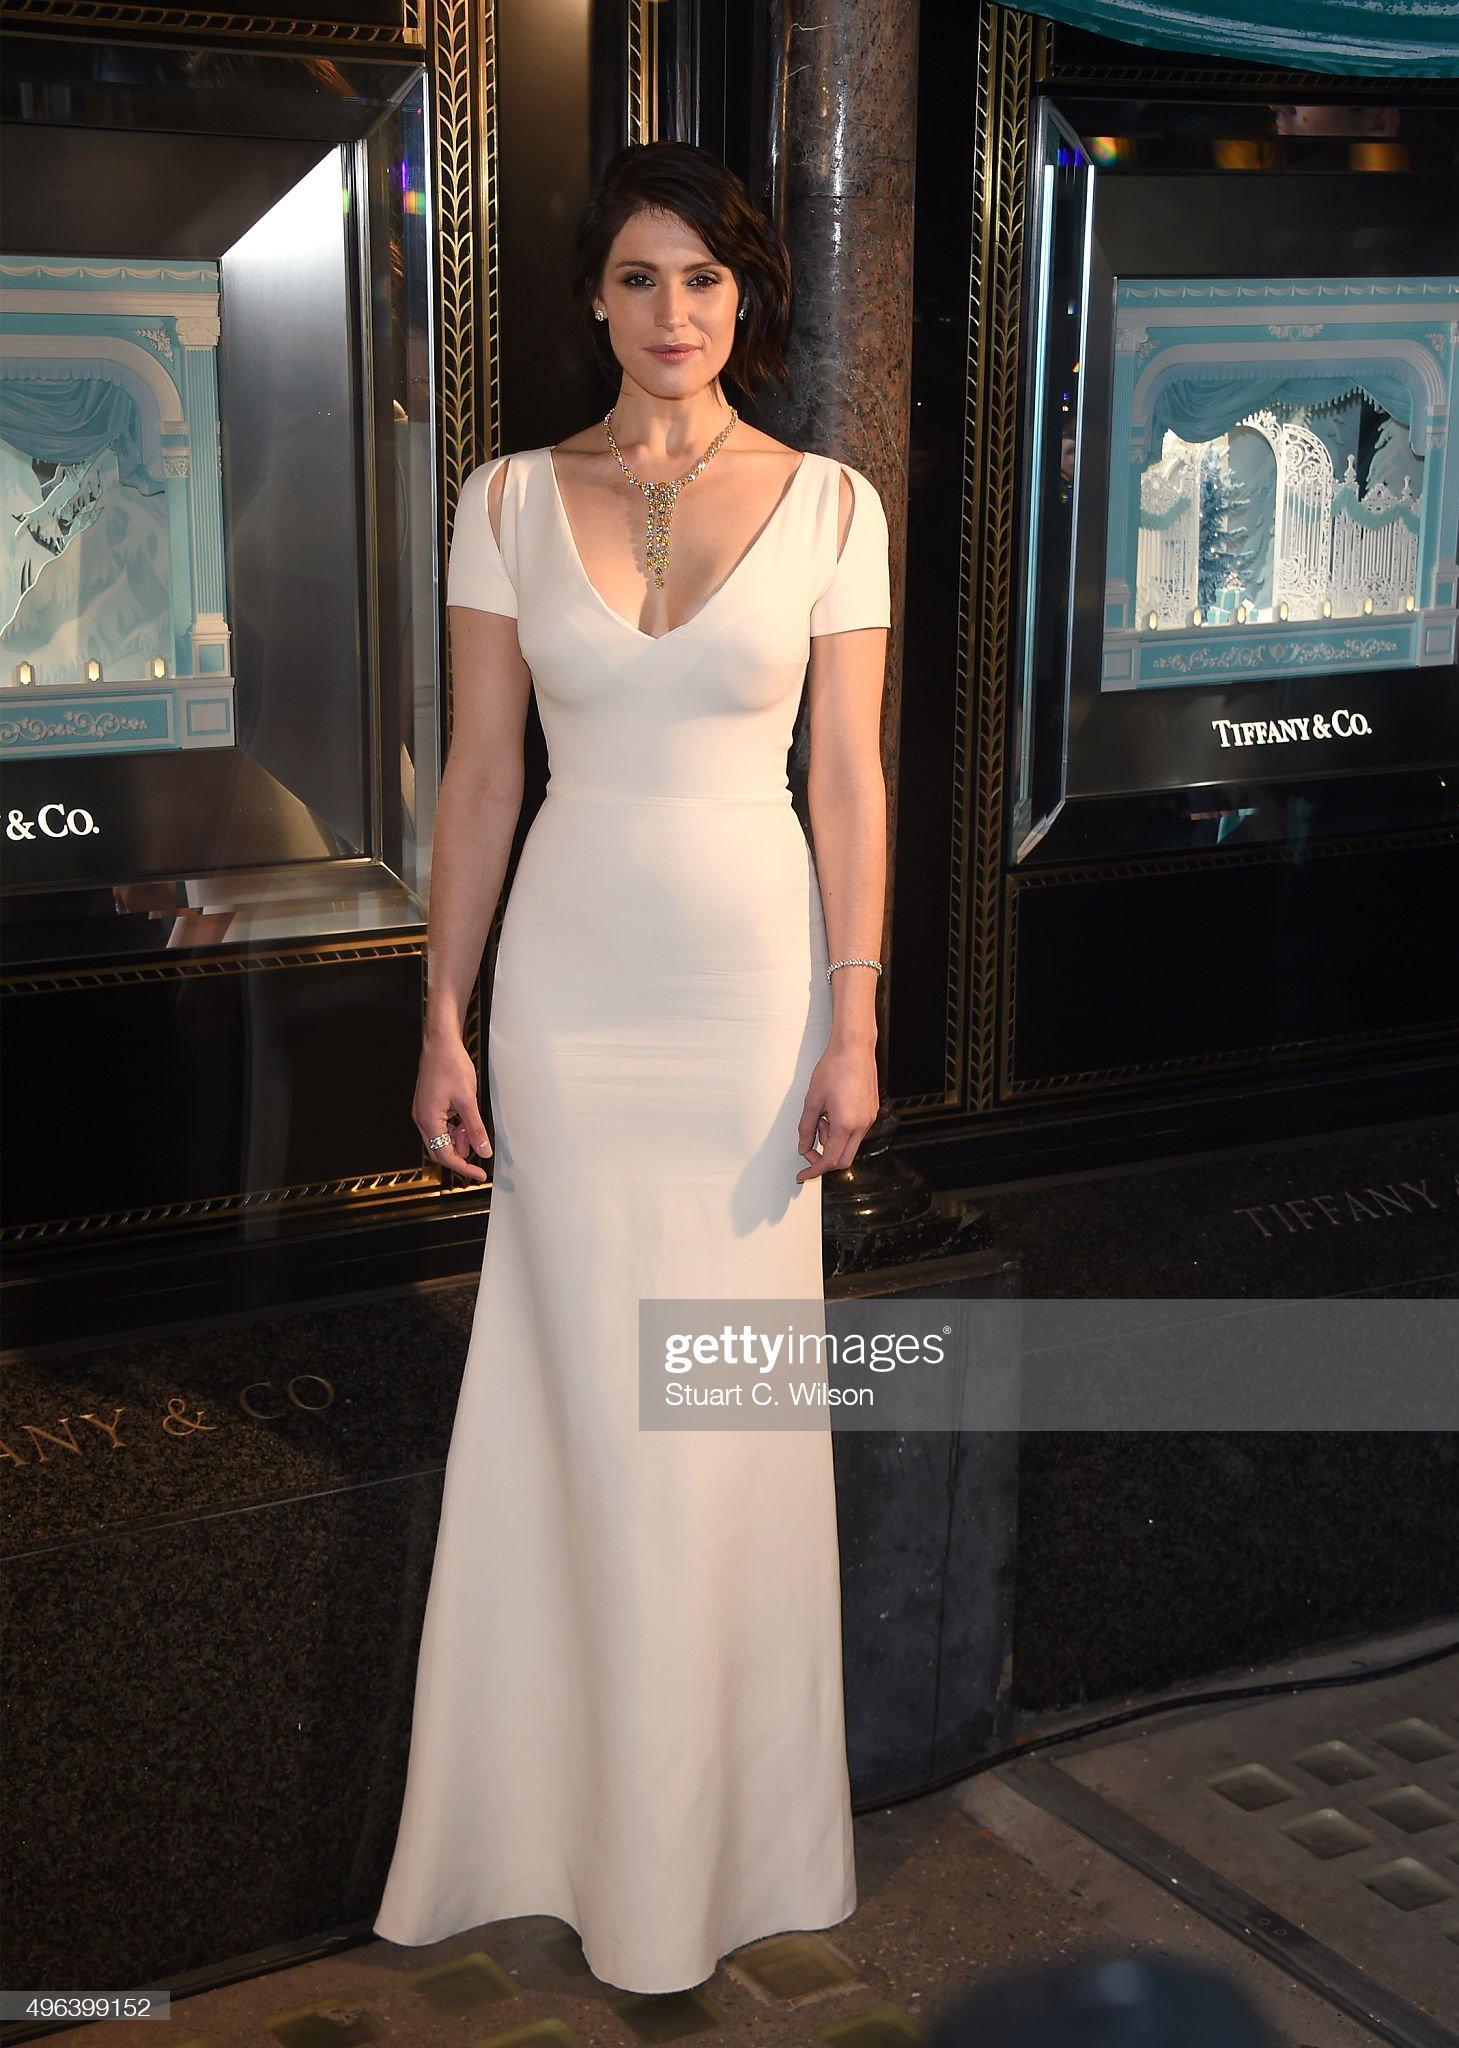 actress-gemma-arterton-reveals-the-2015-tiffany-co-christmas-windows-picture-id496399152